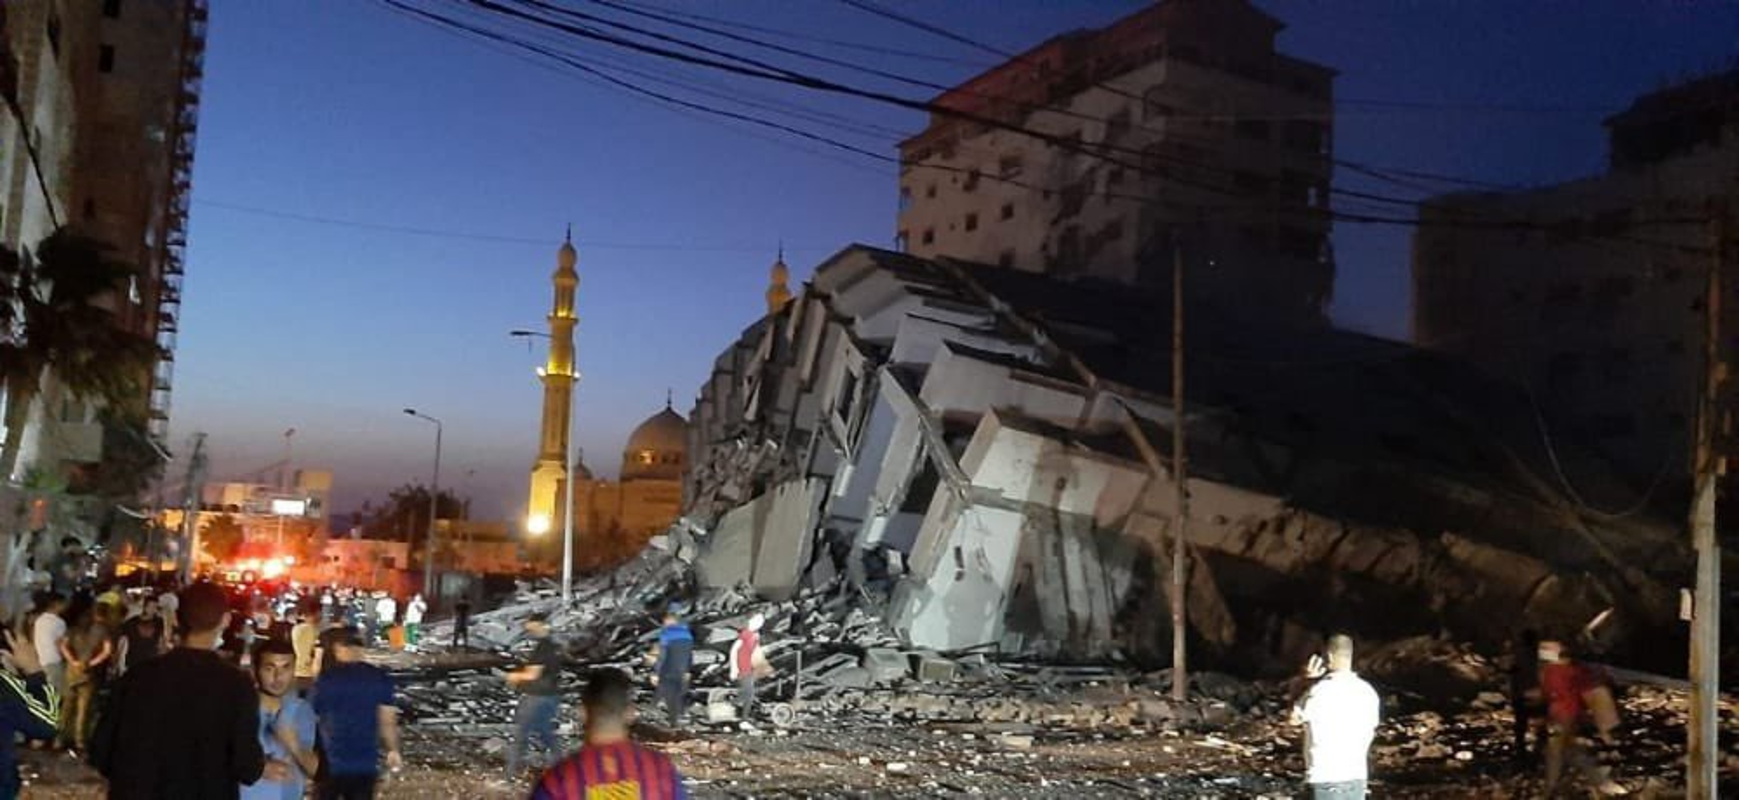 Bi Israel danh sap nha, Hamas phong mua phao phan luc dap tra